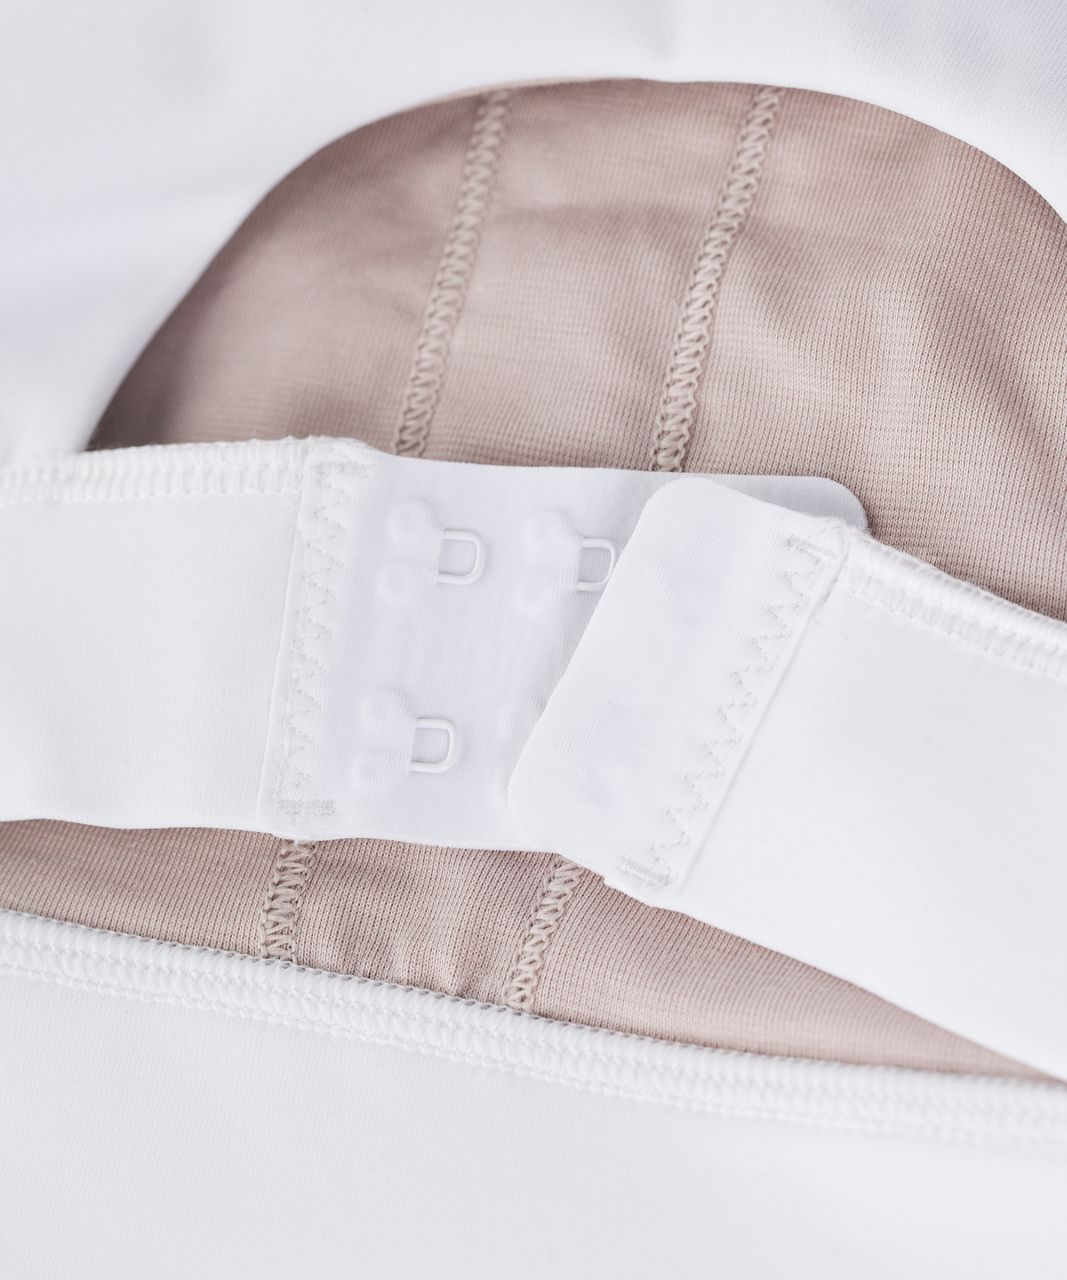 Lululemon Glide And Stride Bra - White